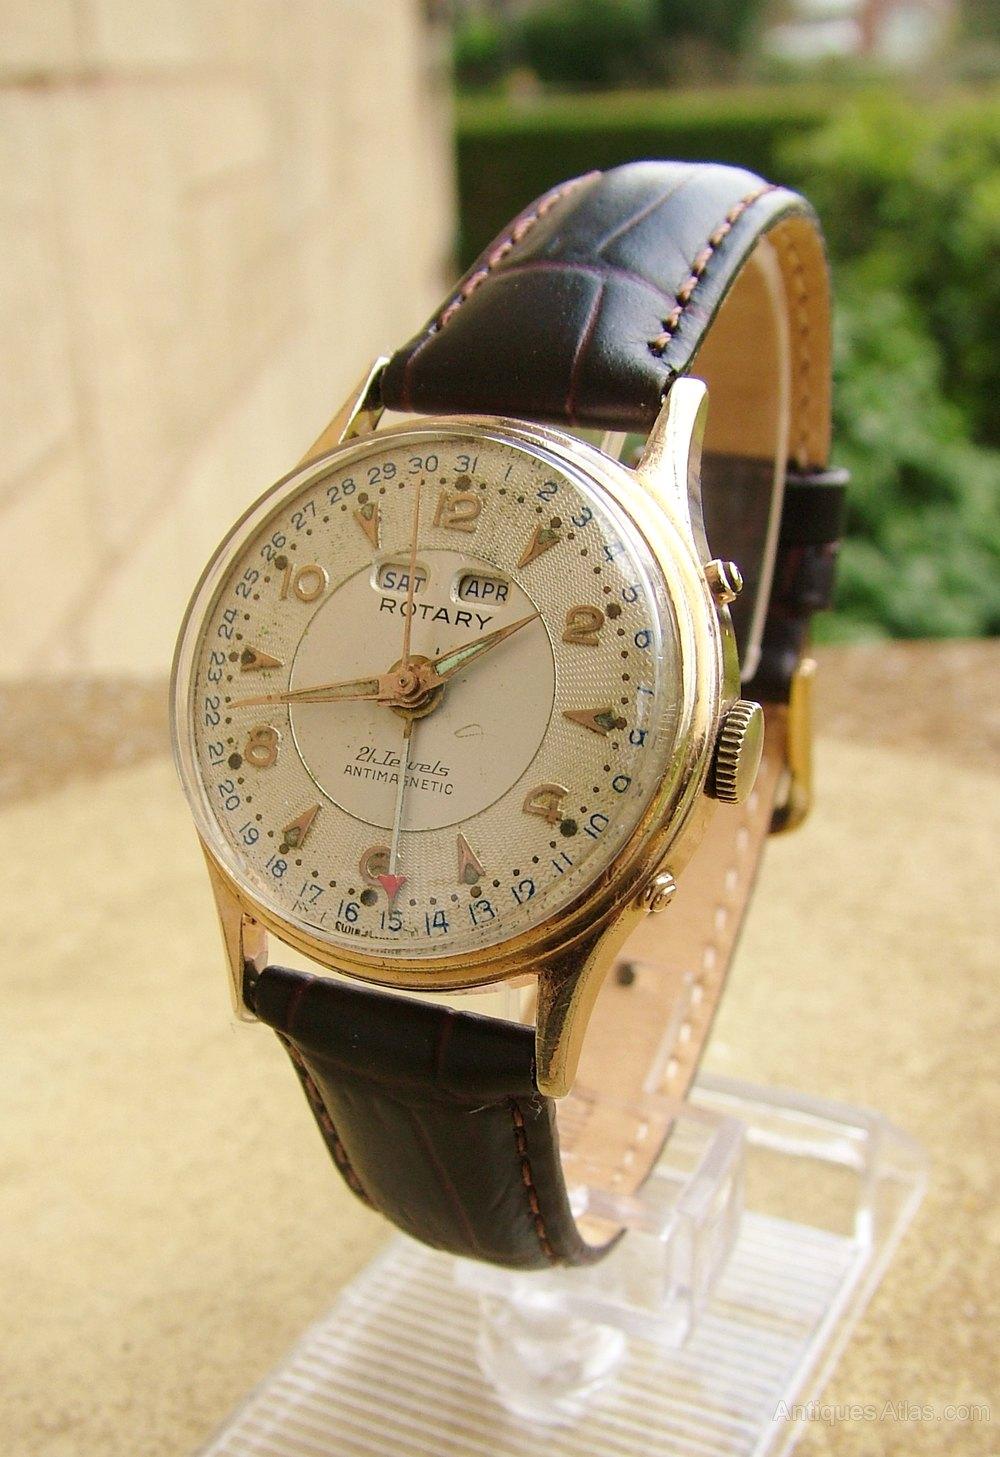 Mens Black Analog Wrist Watch | Best Price | toko.lk